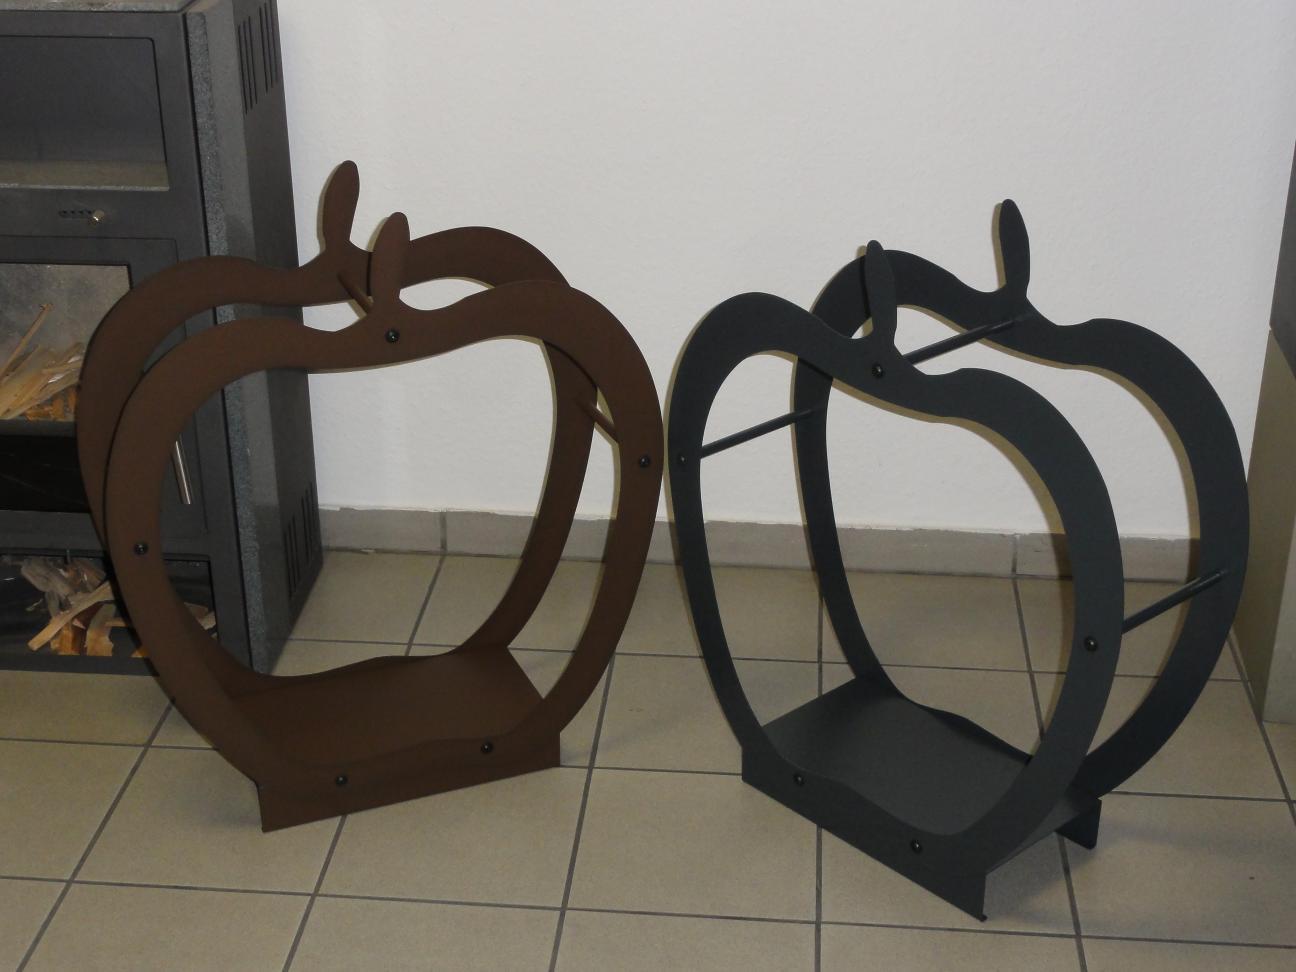 kaminholzregal innen apfel aus metall. Black Bedroom Furniture Sets. Home Design Ideas